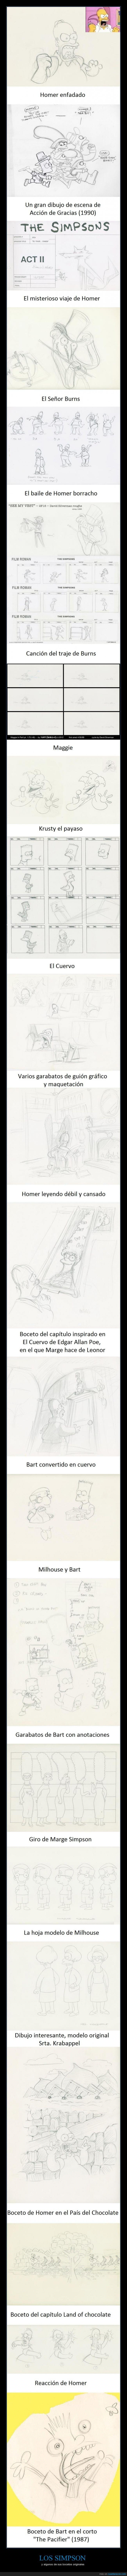 Bart,Bocetos,David Silverman,Edgar Allan Poe,El Cuervo,Homer,Krusty el payaso,lápiz,Lisa,Los Simpson,Maggie,Marge,Matt Groening,Milhouse,Señor Burns,Señorita Krabappel